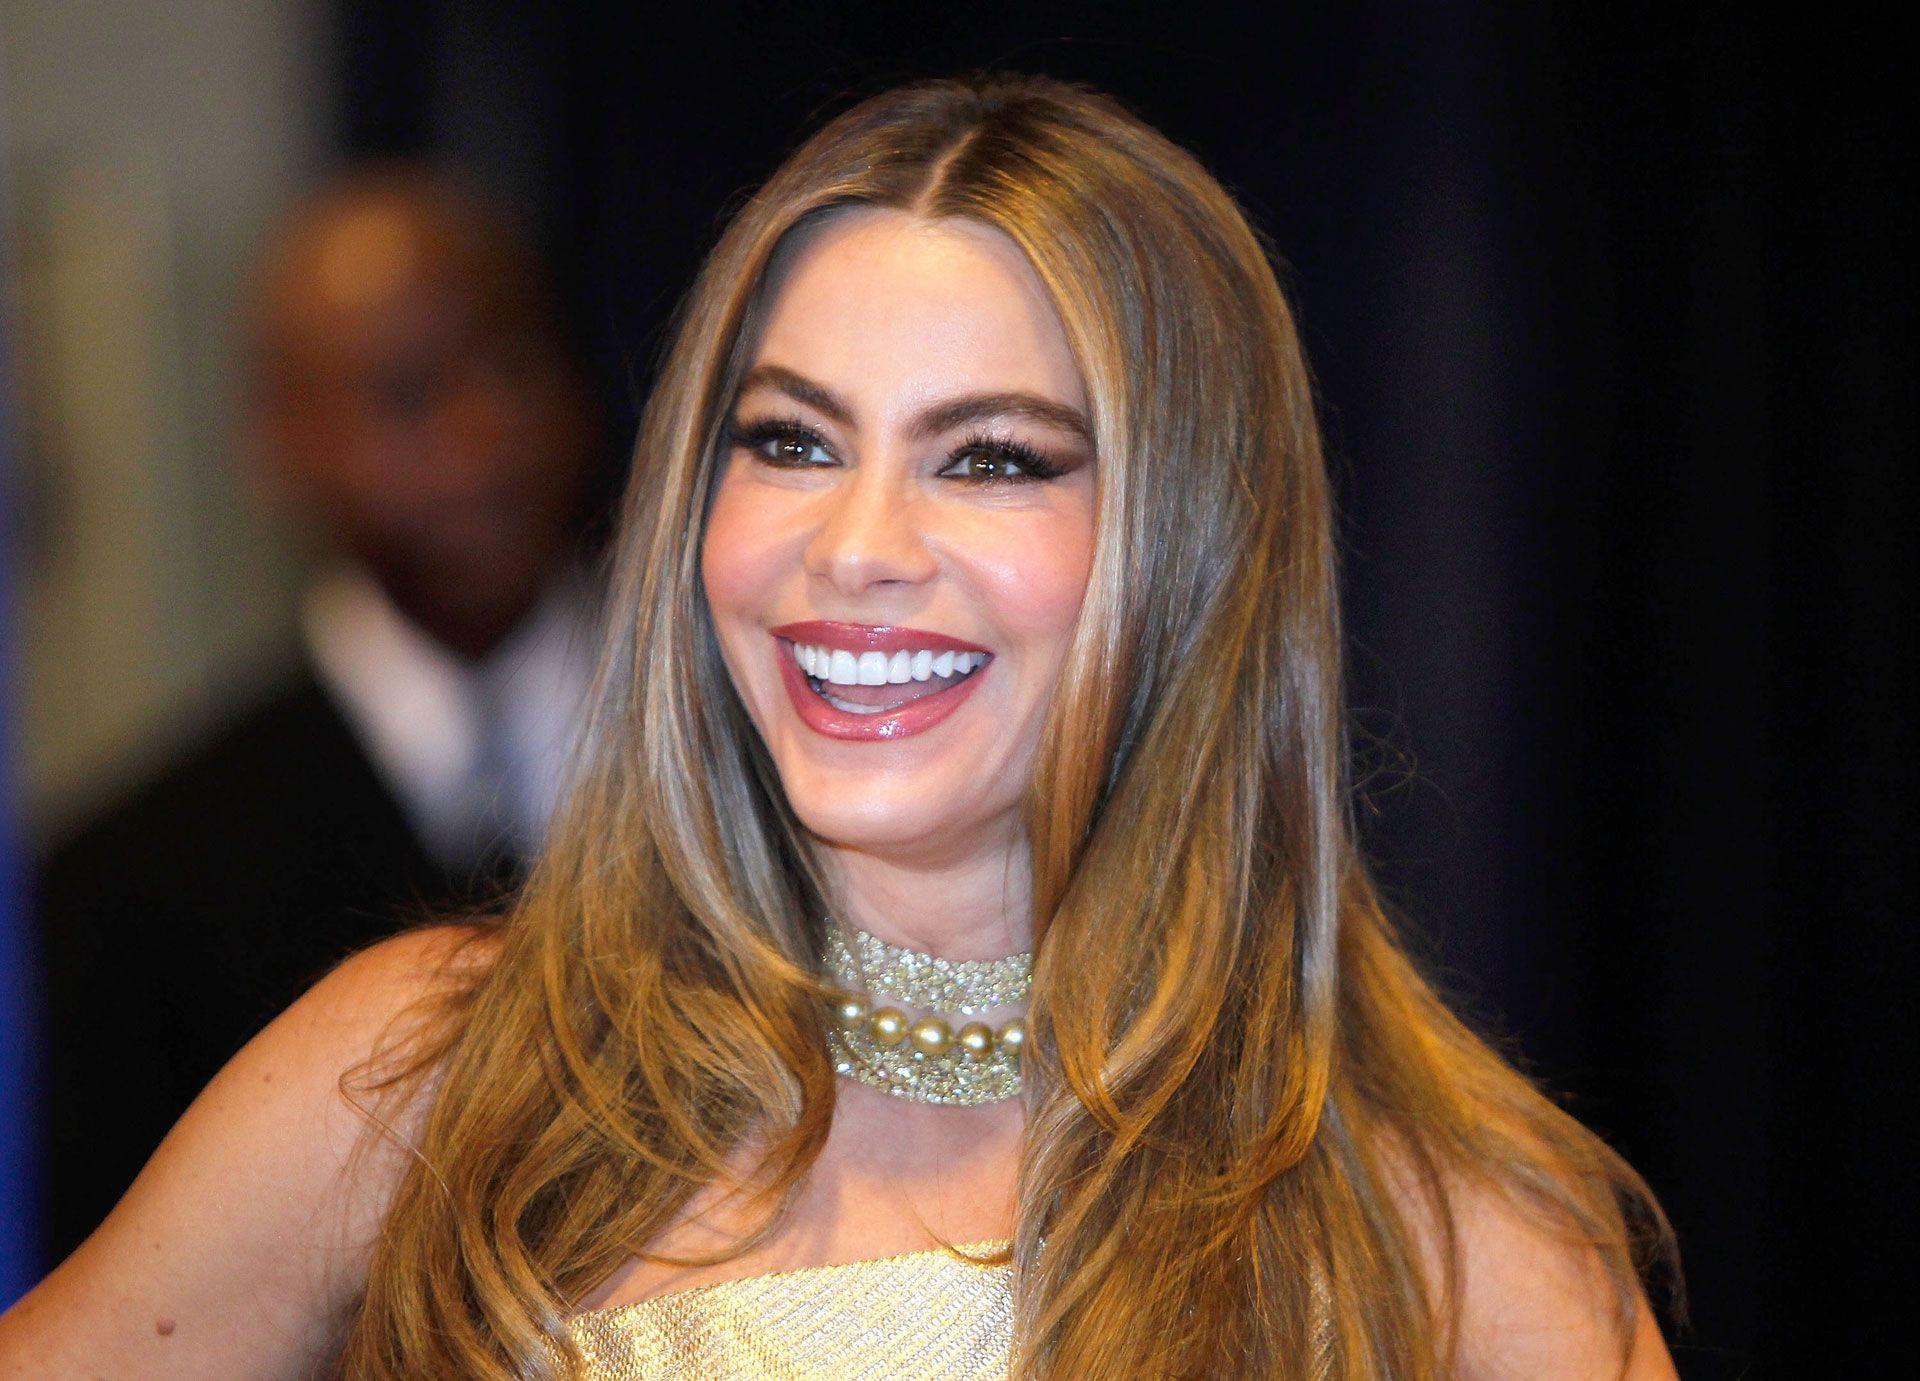 Fashion style Sofia hairspiration vergaras waves for lady